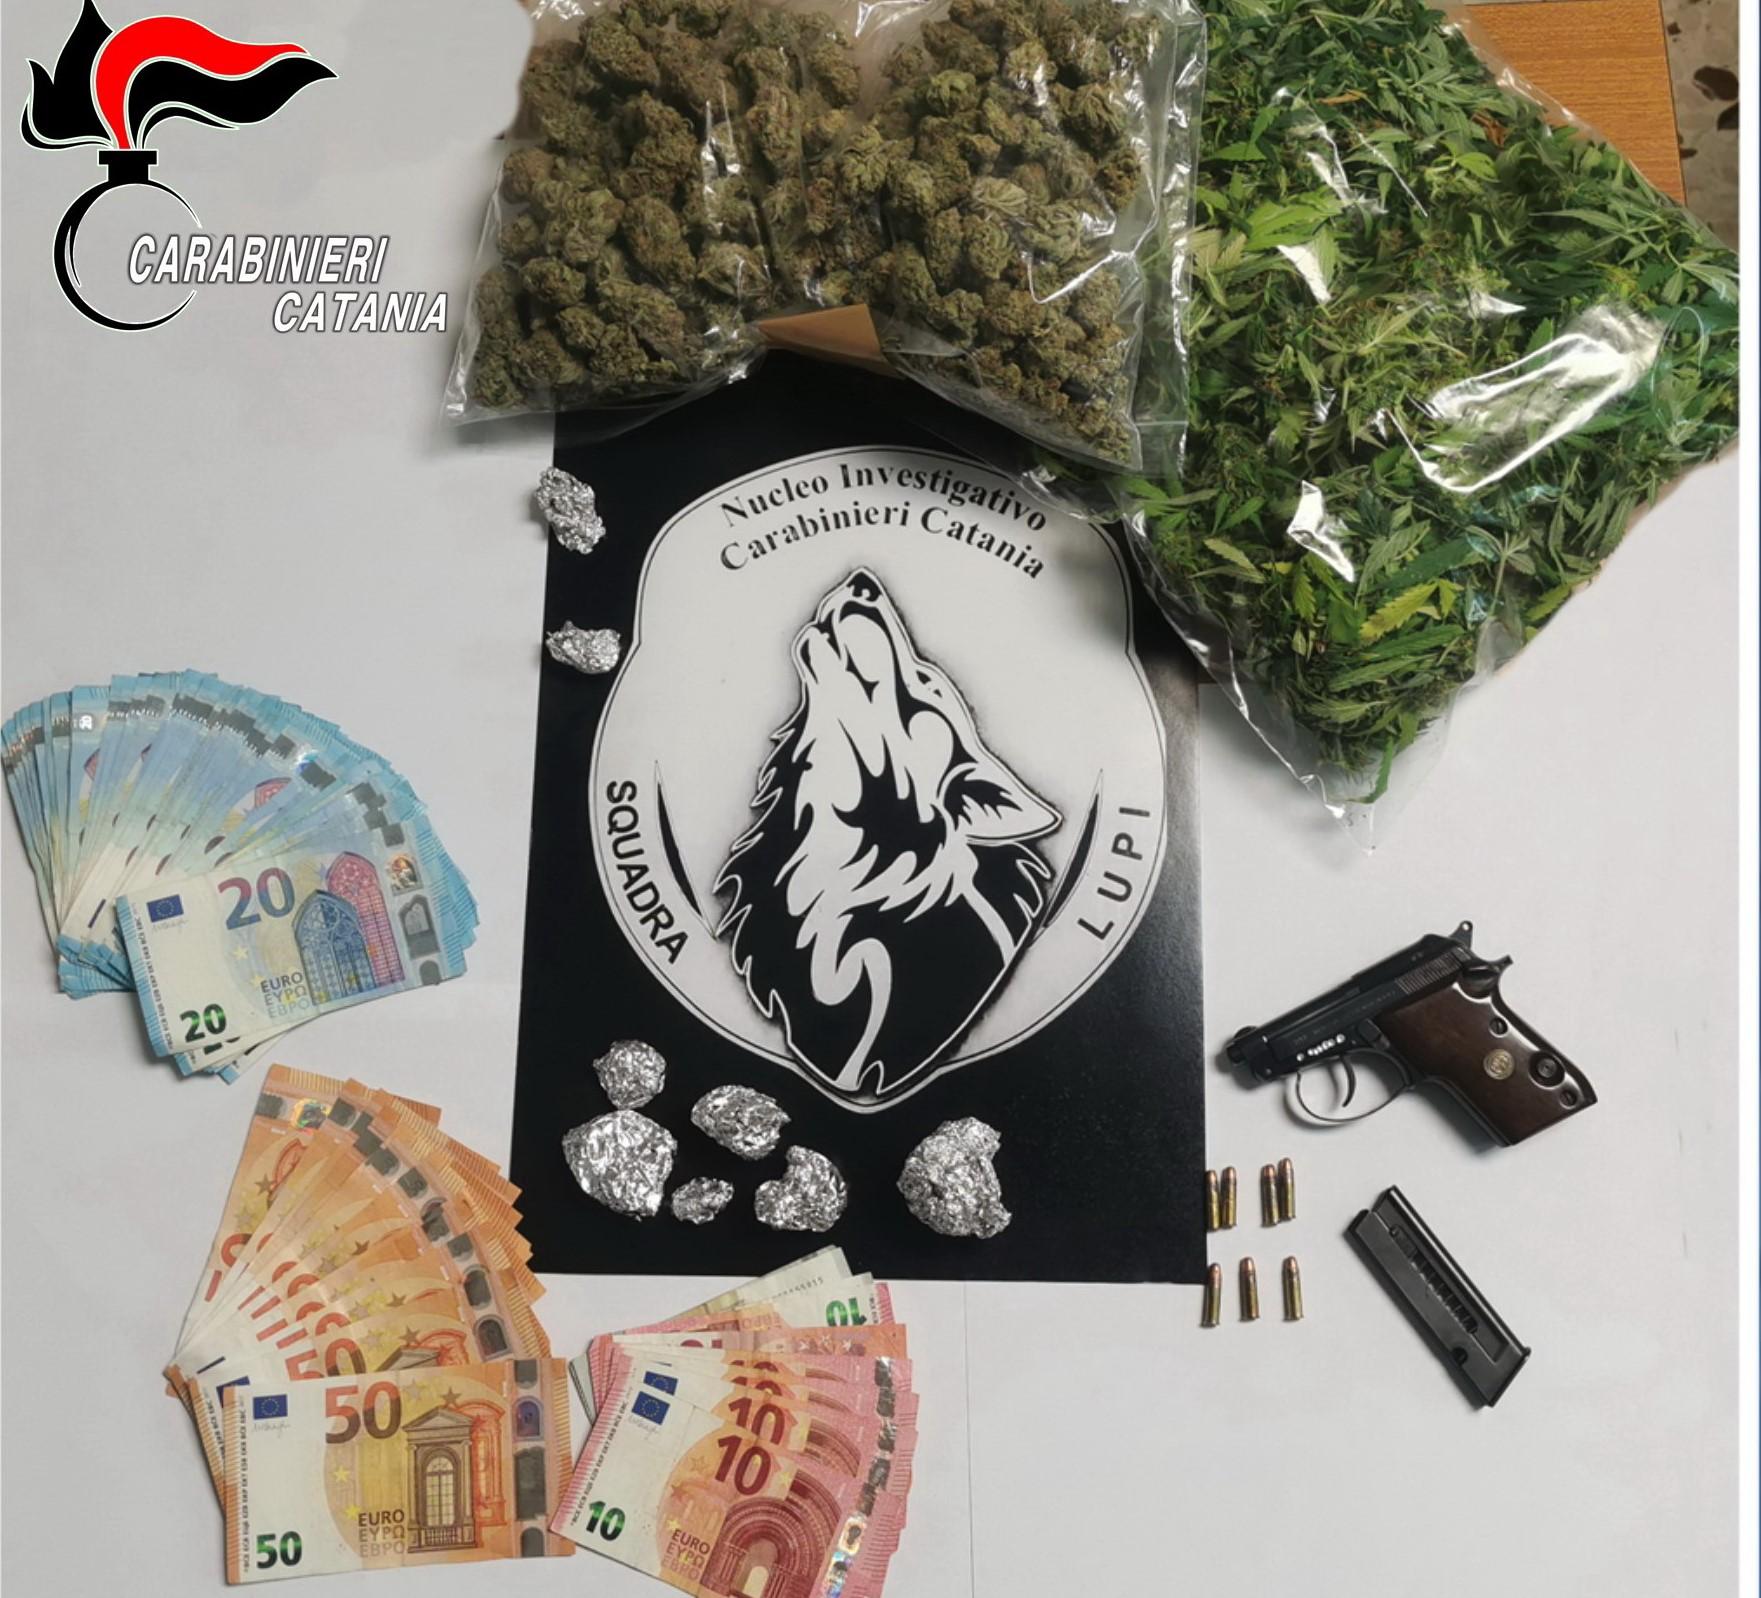 Tremestieri Etneo, carabinieri sequestrano armi e droga: due arrestati